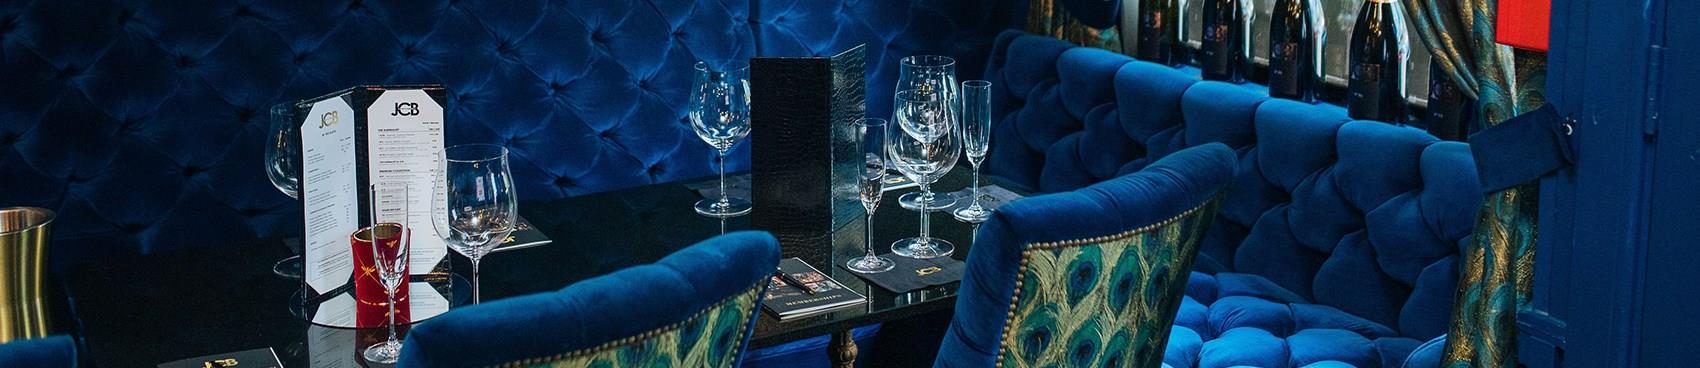 A image of JCB Tasting Salon- Healdsburg